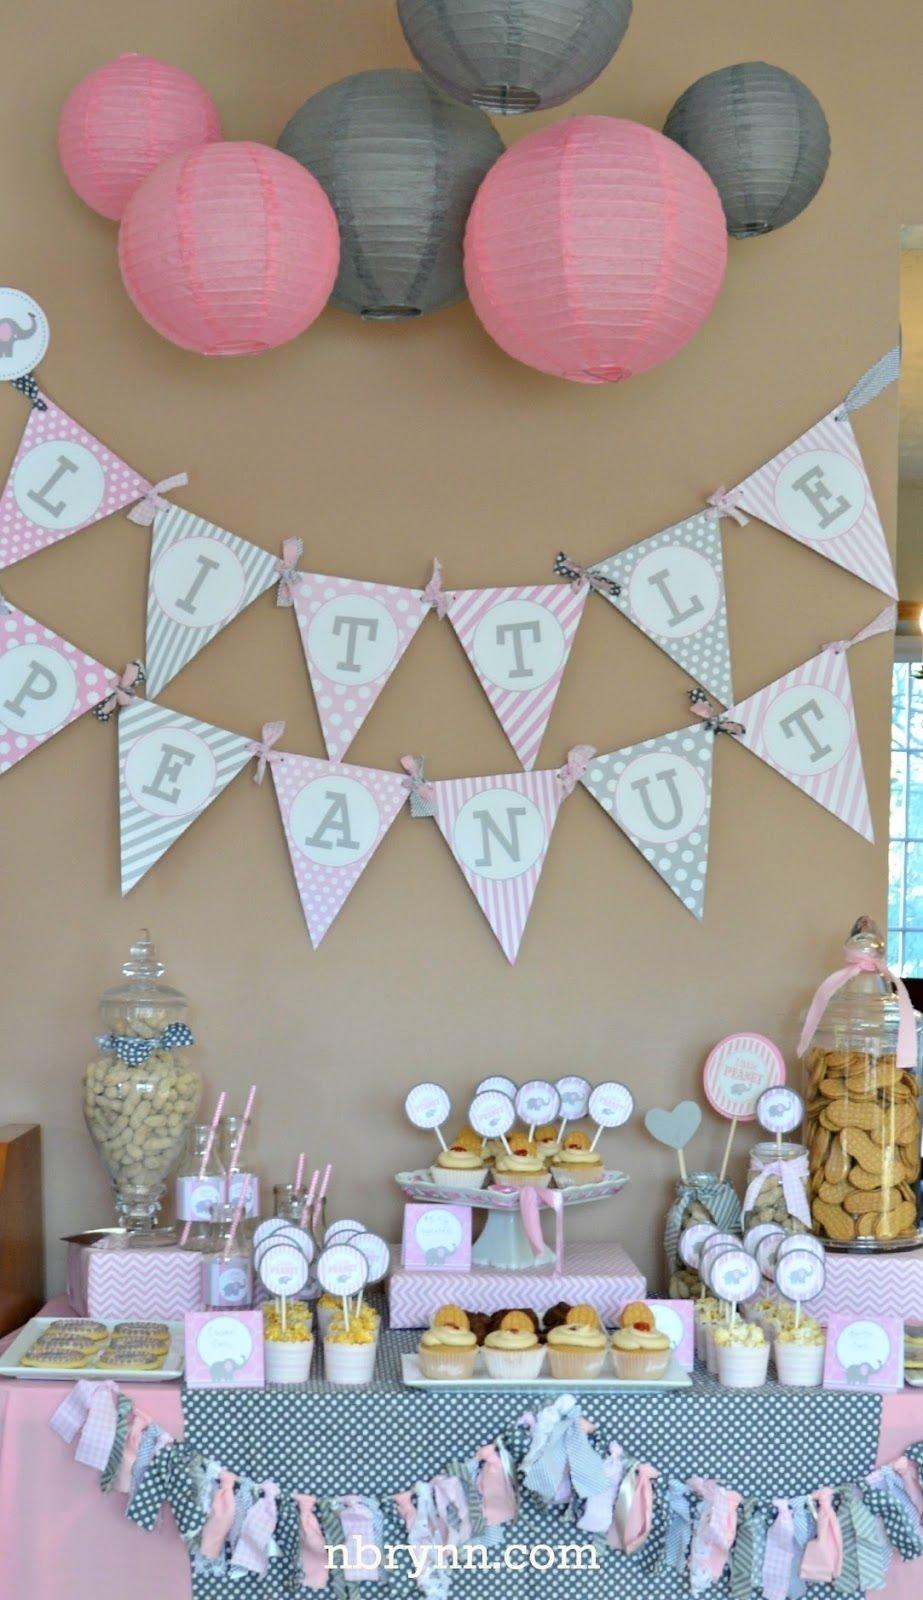 10 Pretty Ideas For A Baby Shower nbrynn little peanut baby shower party ideas pinterest peanut